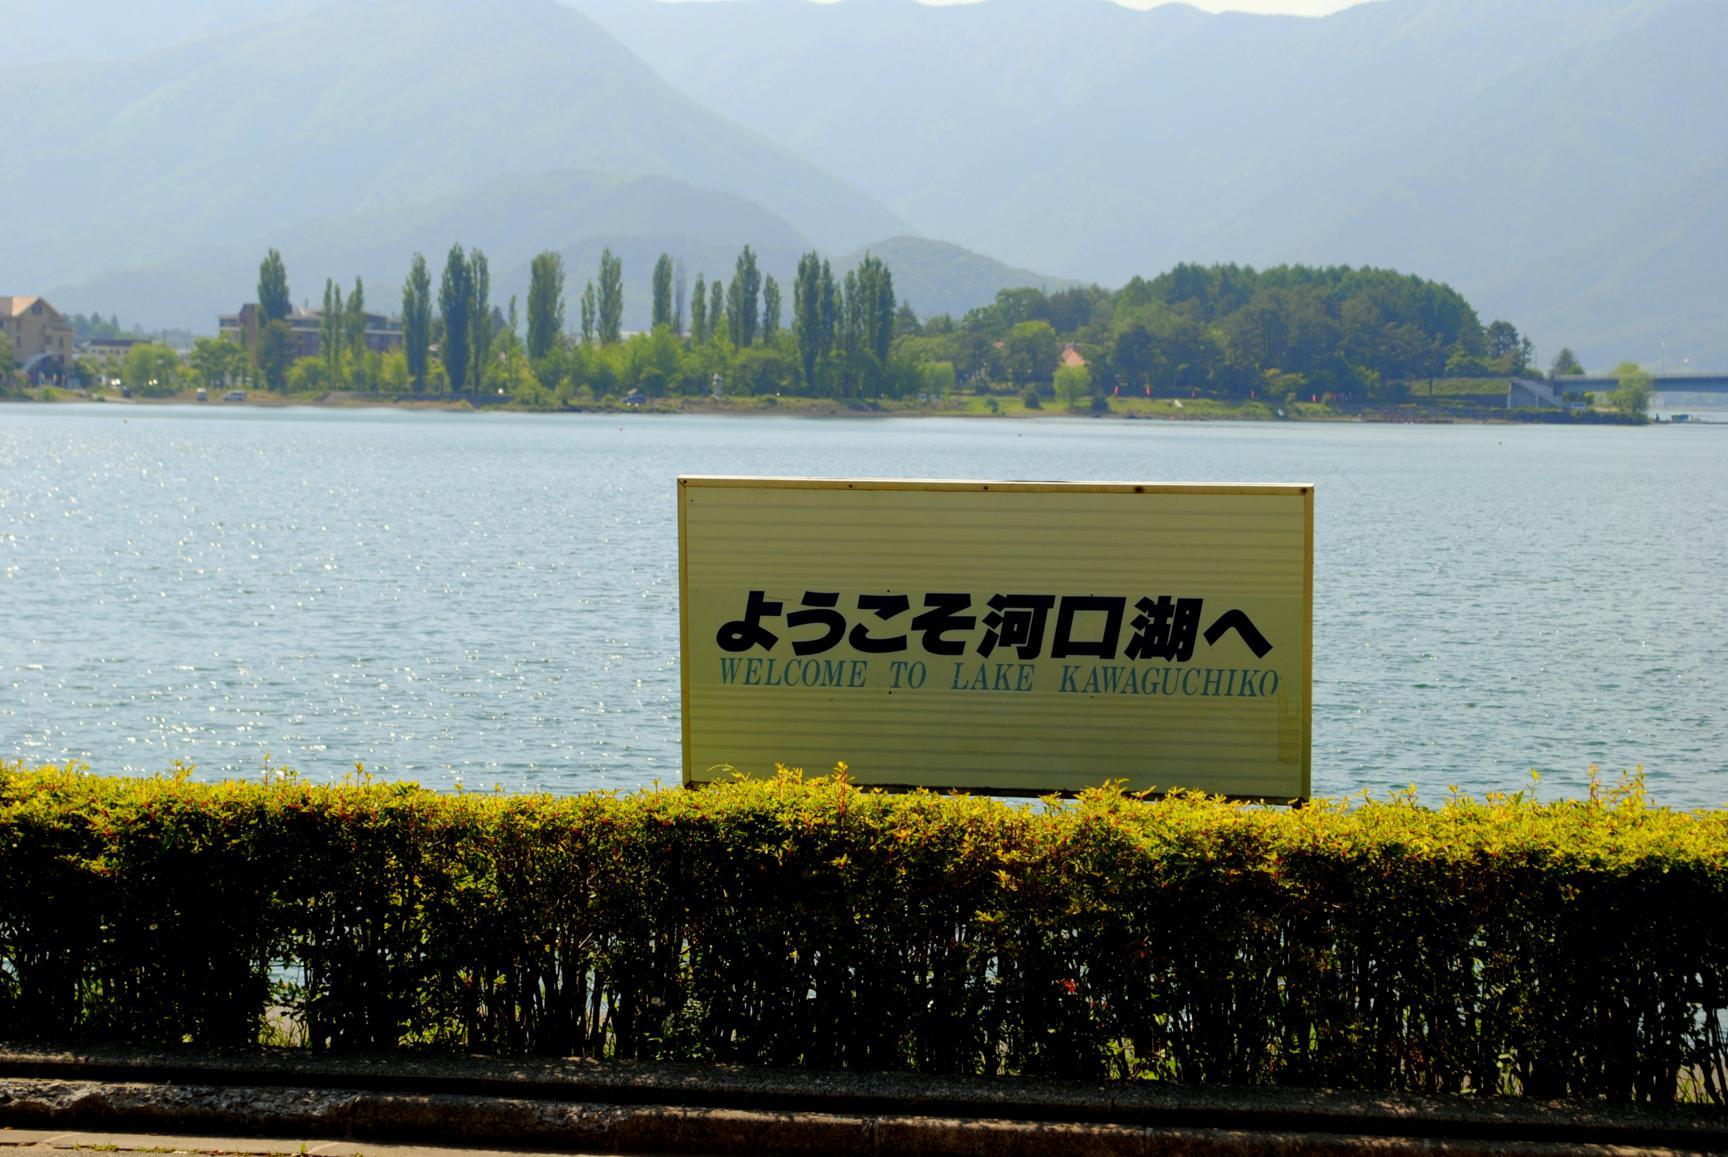 lago-kawaguchico-1